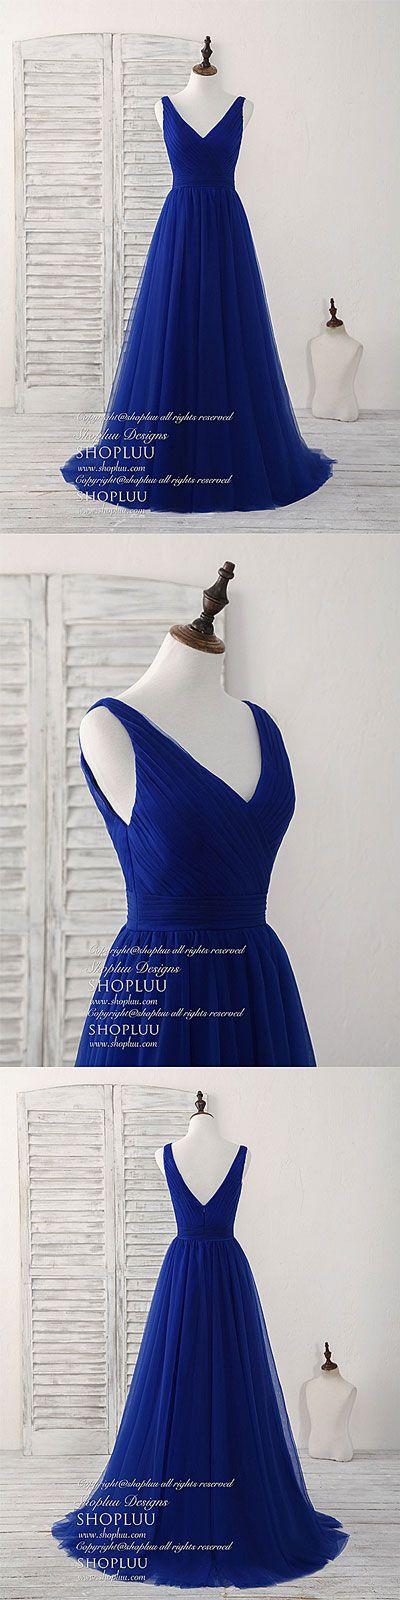 Simple v neck Royal blue tulle long prom dress blue evening dress, blue bridesmaid dress